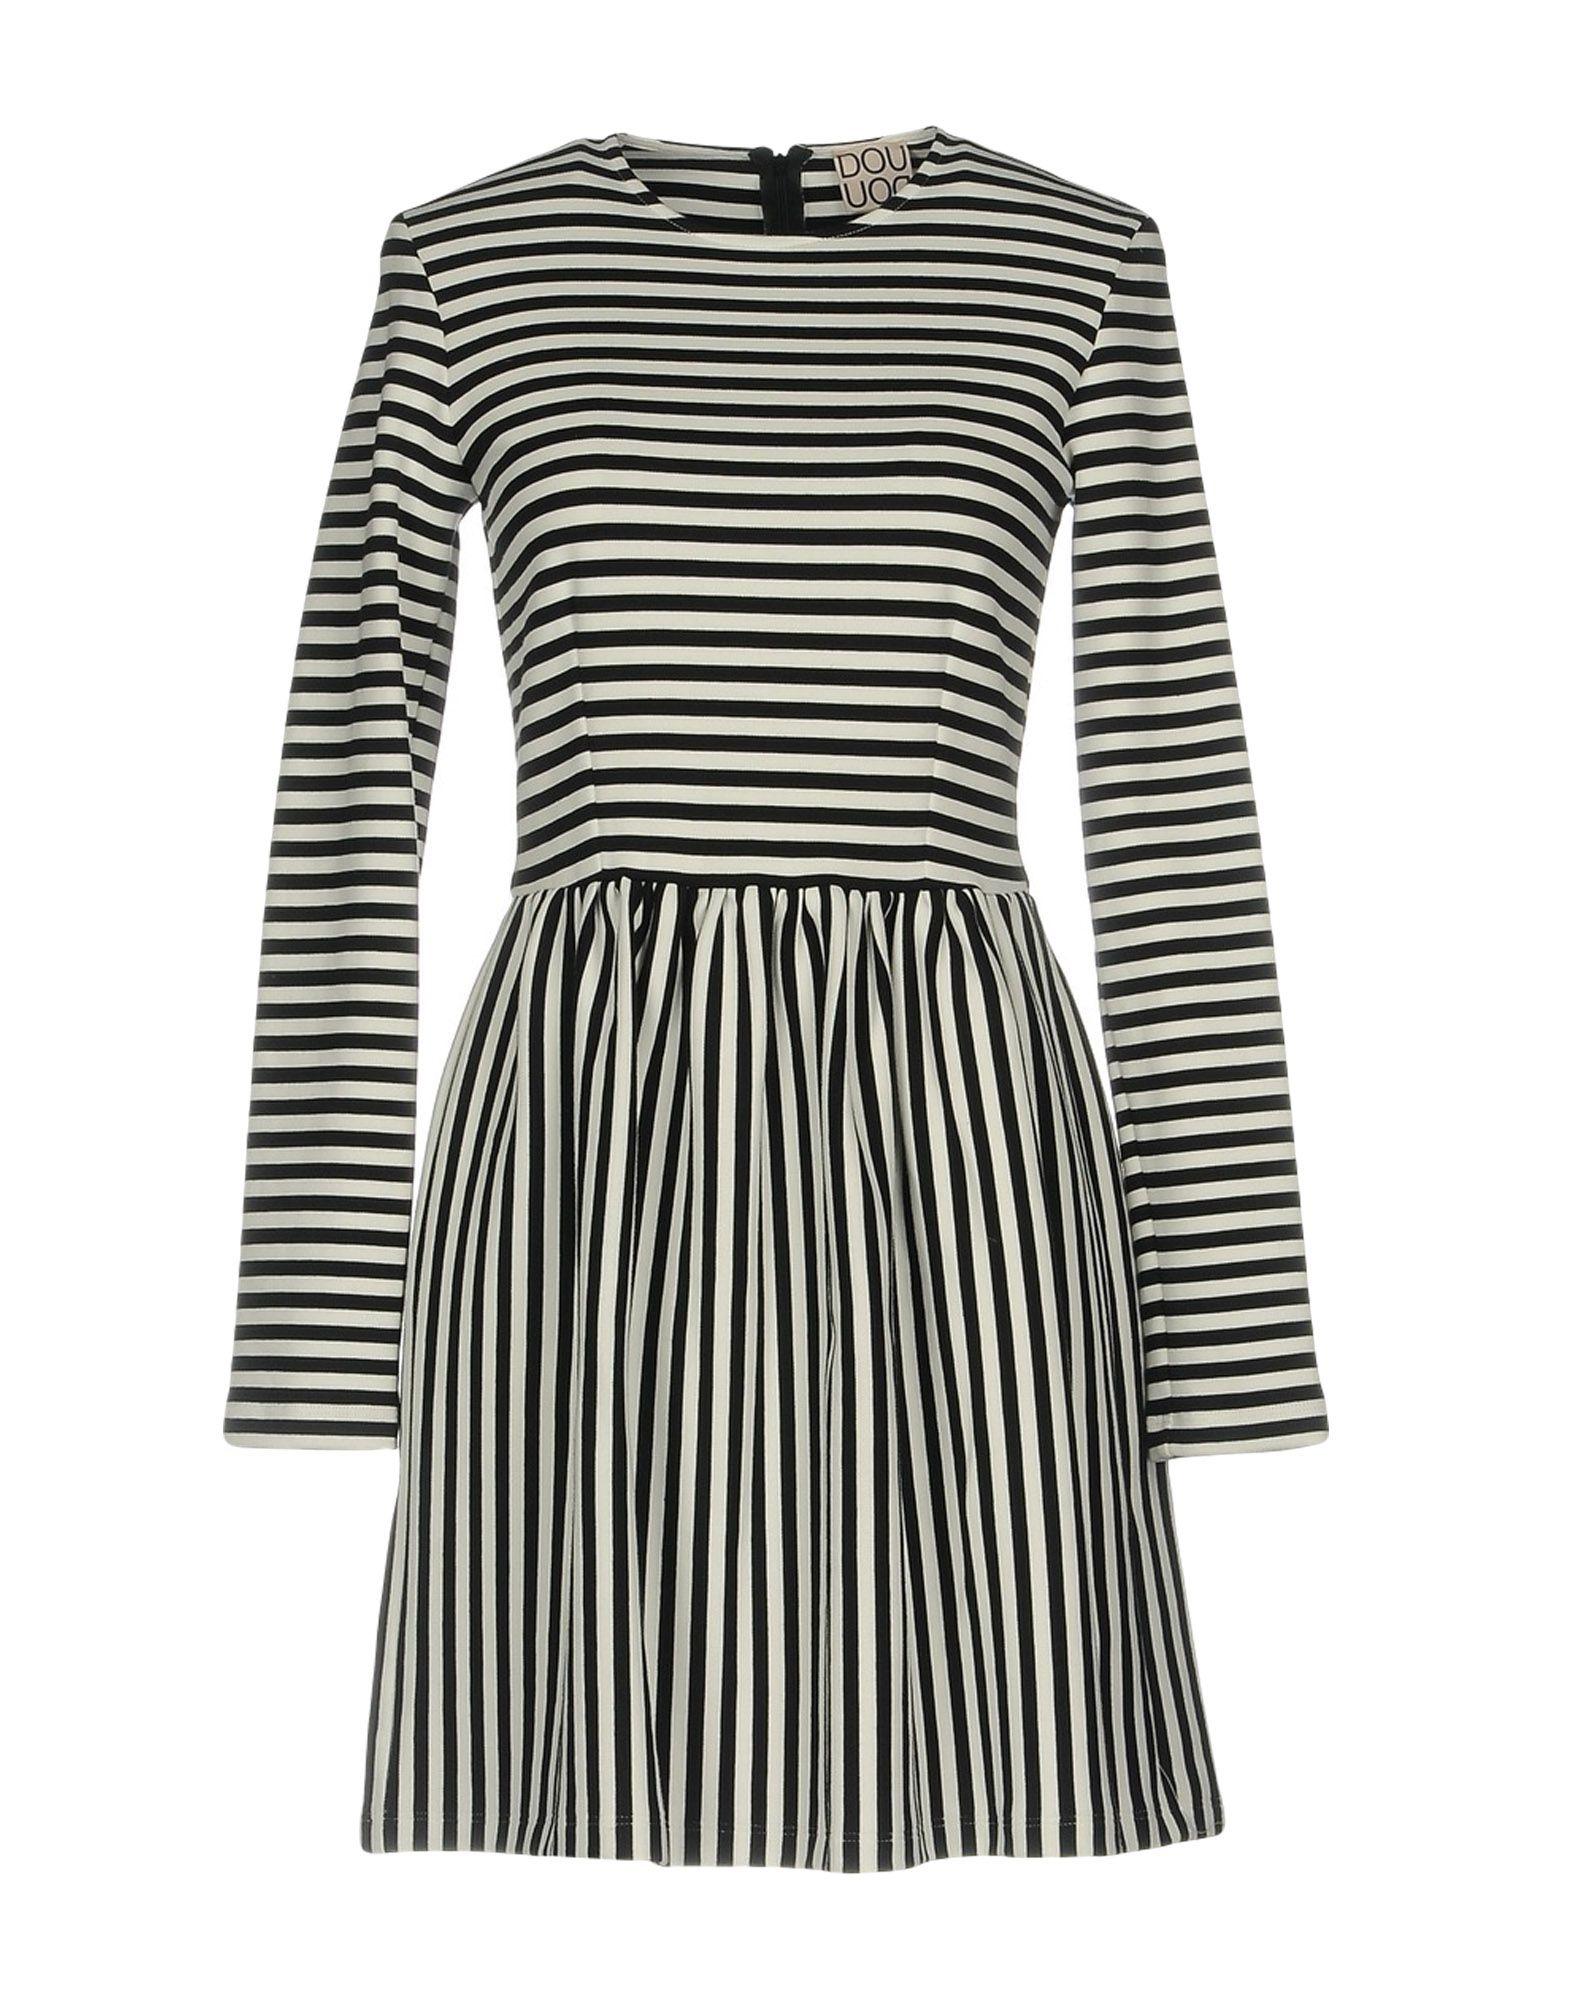 DOUUOD Short Dress in Black